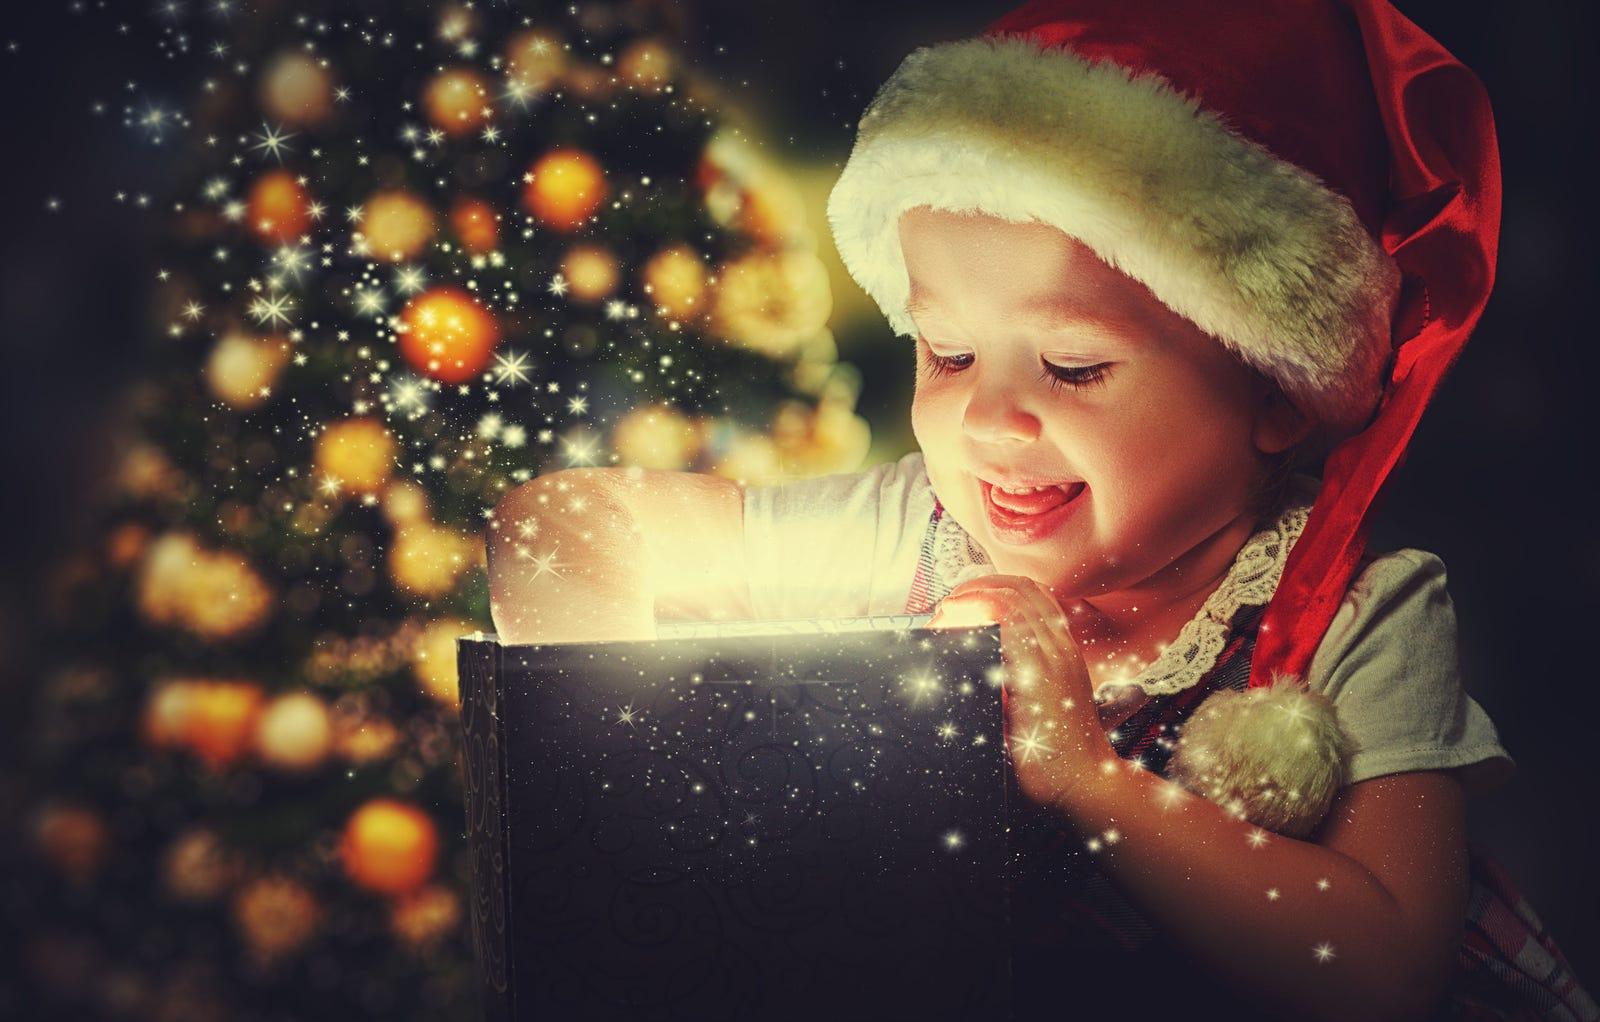 Christmas celebration all around the world